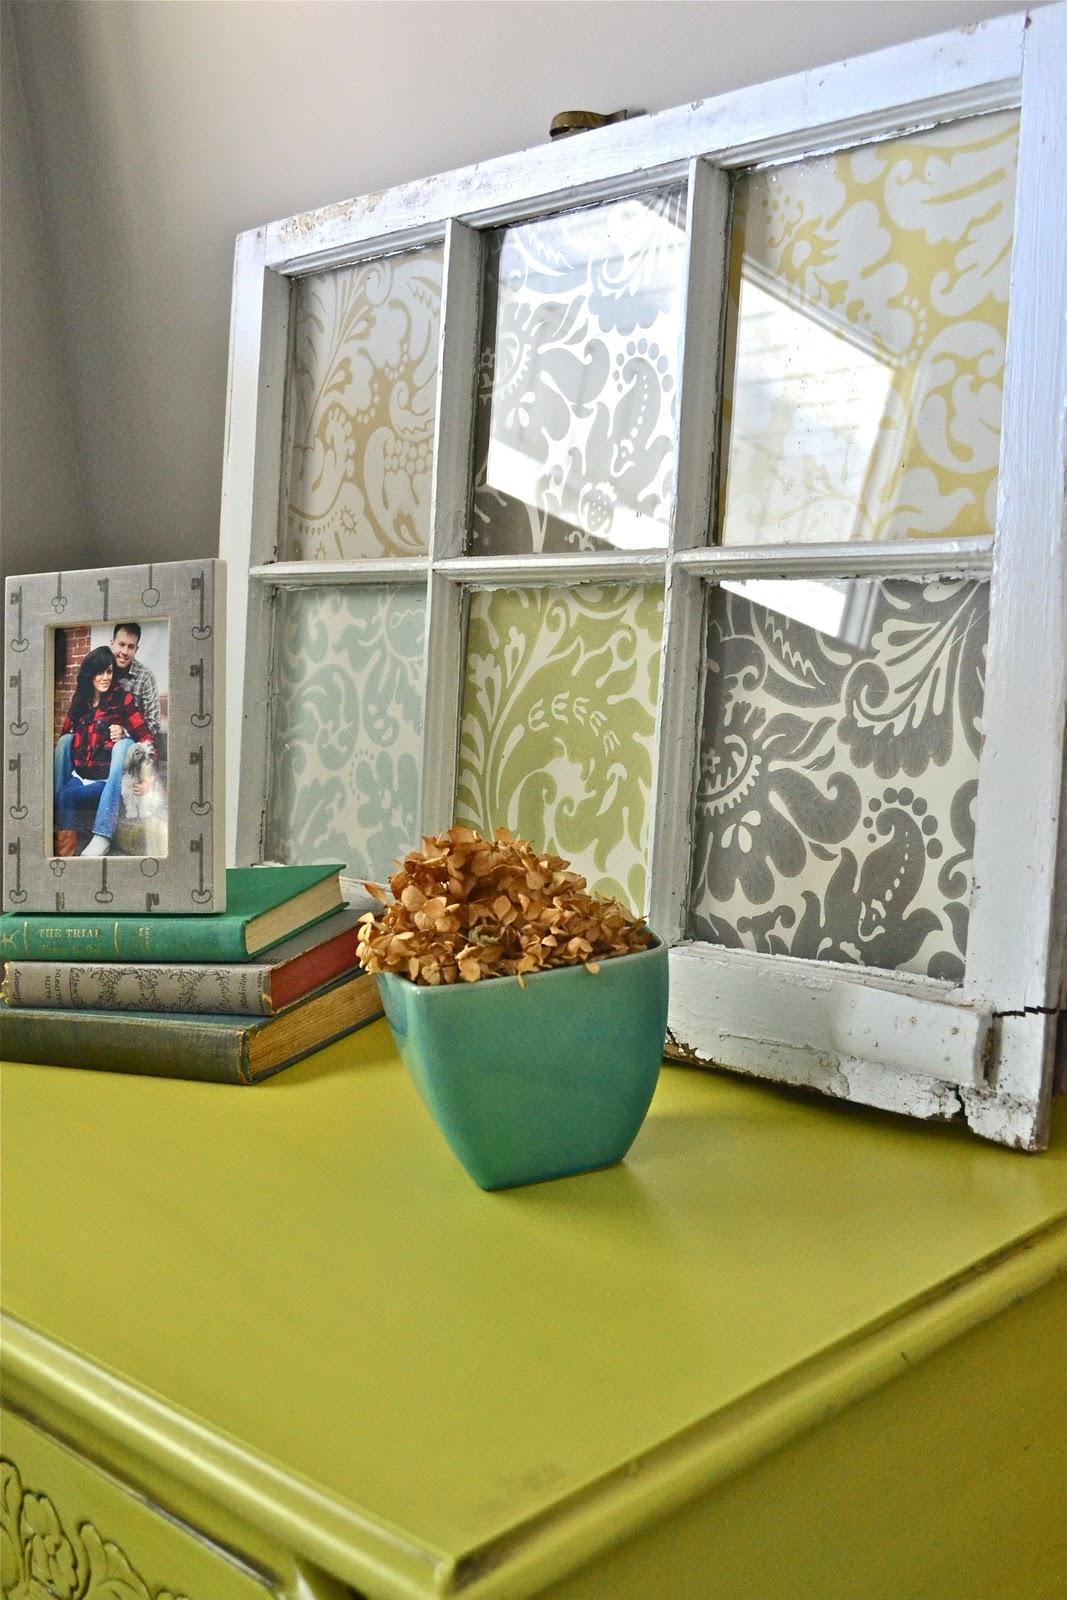 Scrapbook paper in window for decor